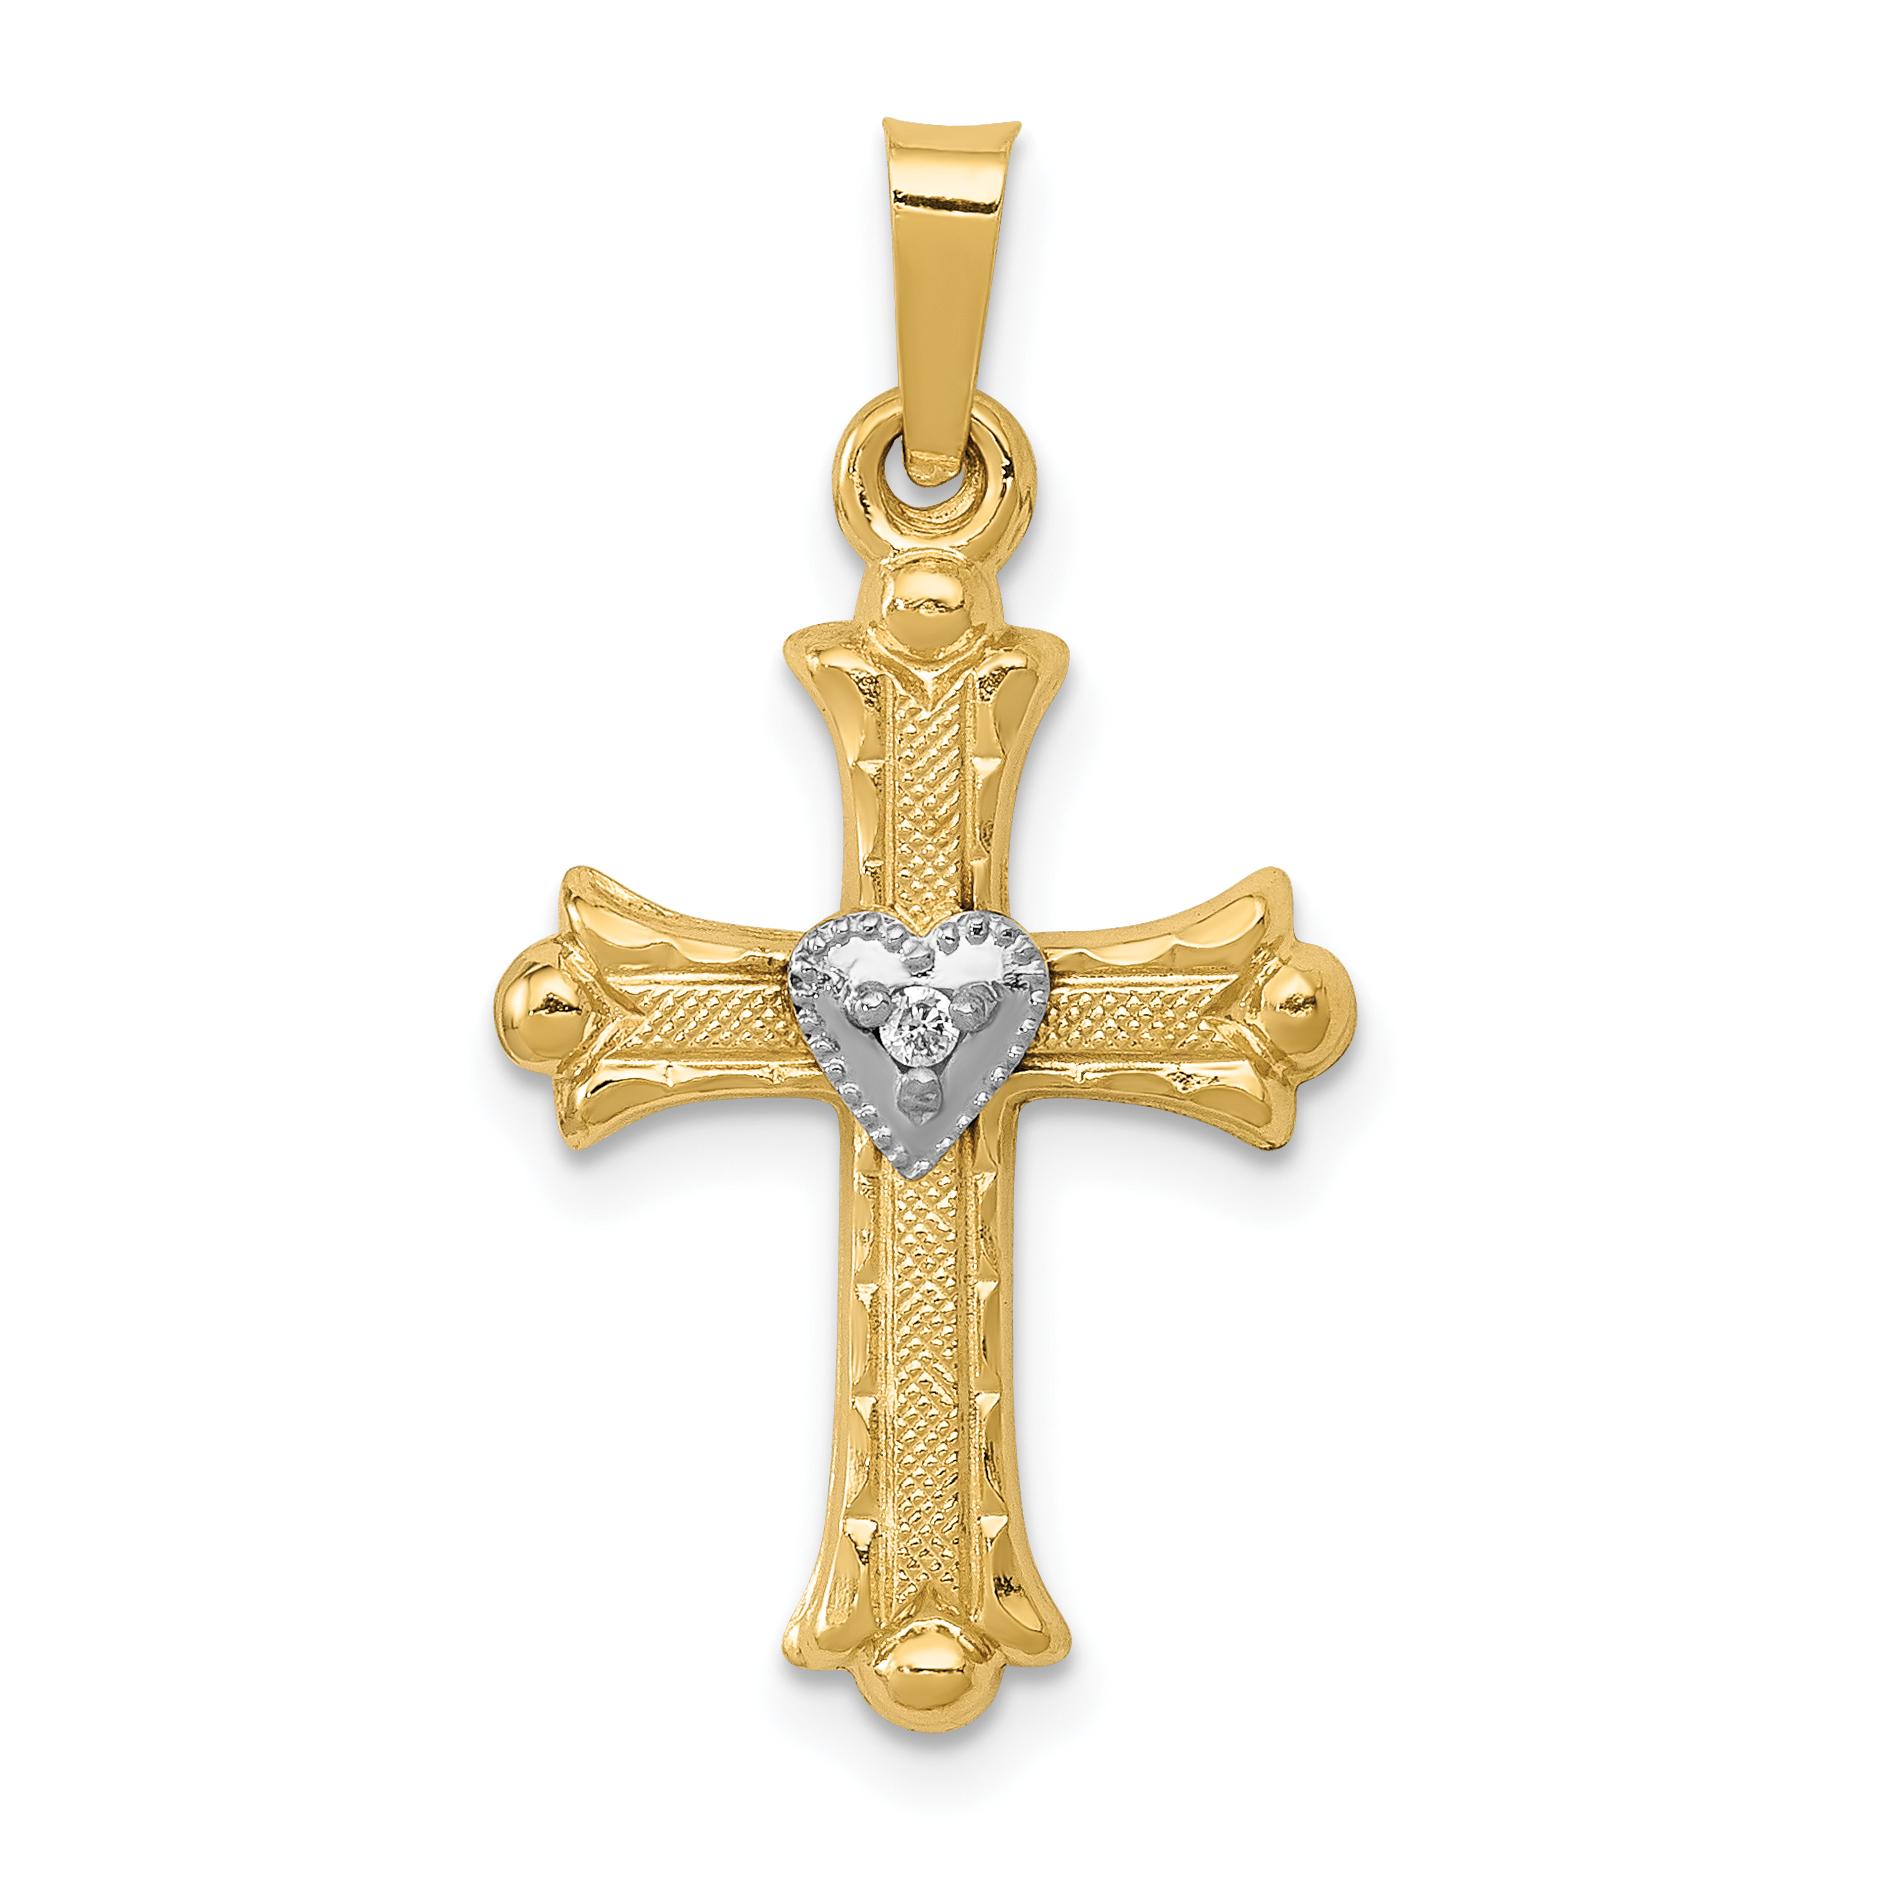 14K Diamond, Textured, Brushed & Polished Fleur de lis Cross Pendant